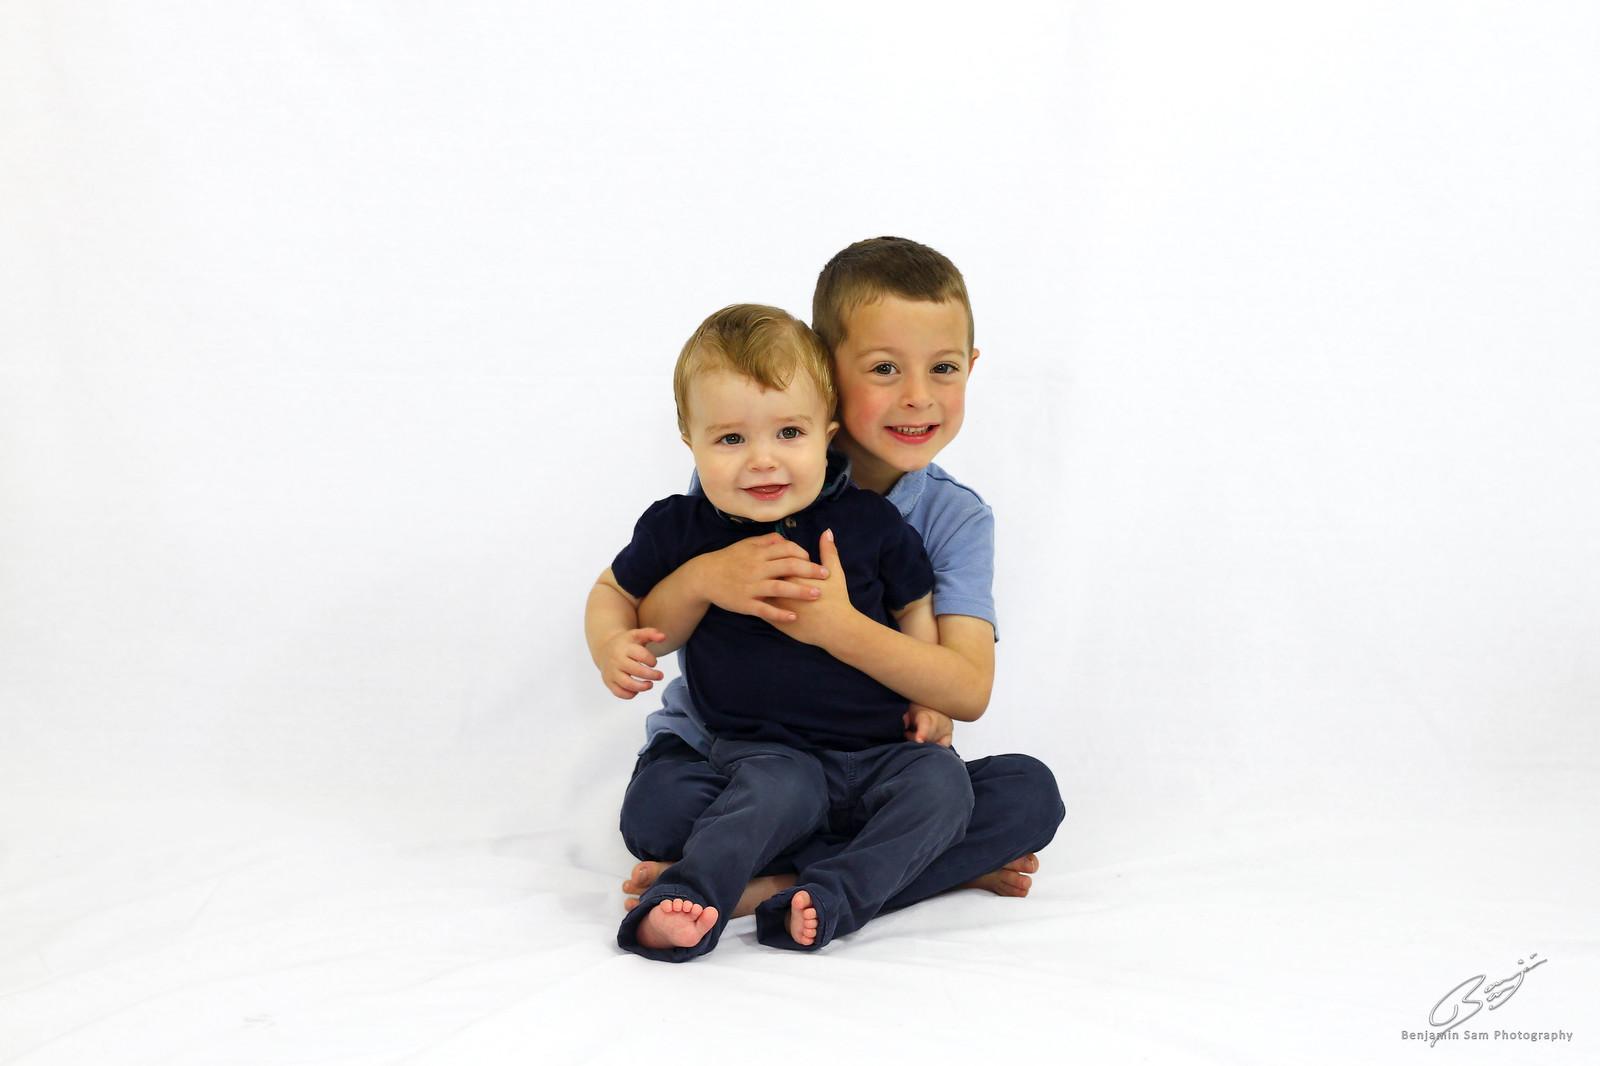 Photoshoot - Brothers